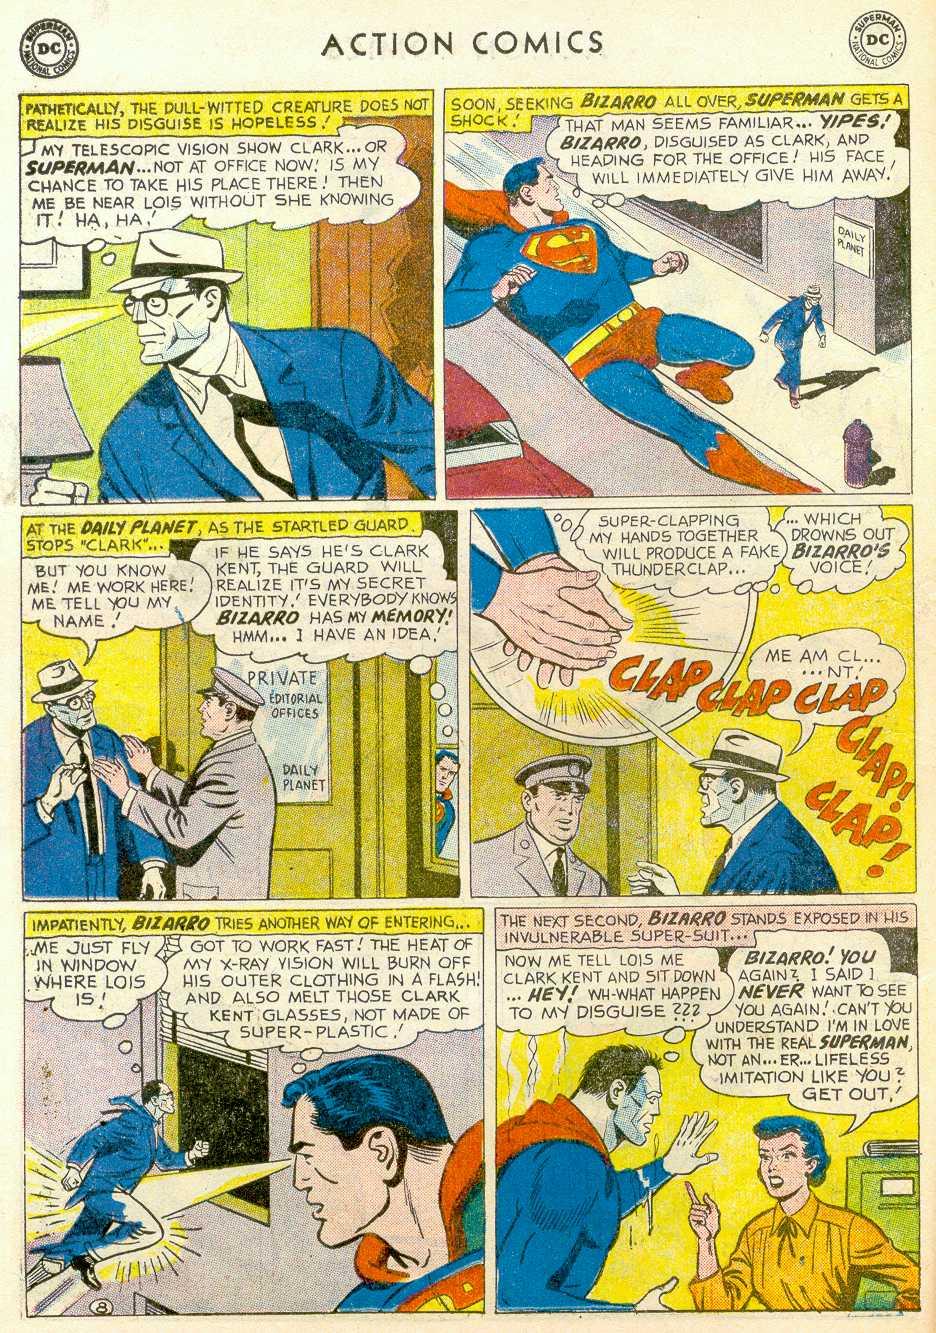 Action Comics (1938) 255 Page 9